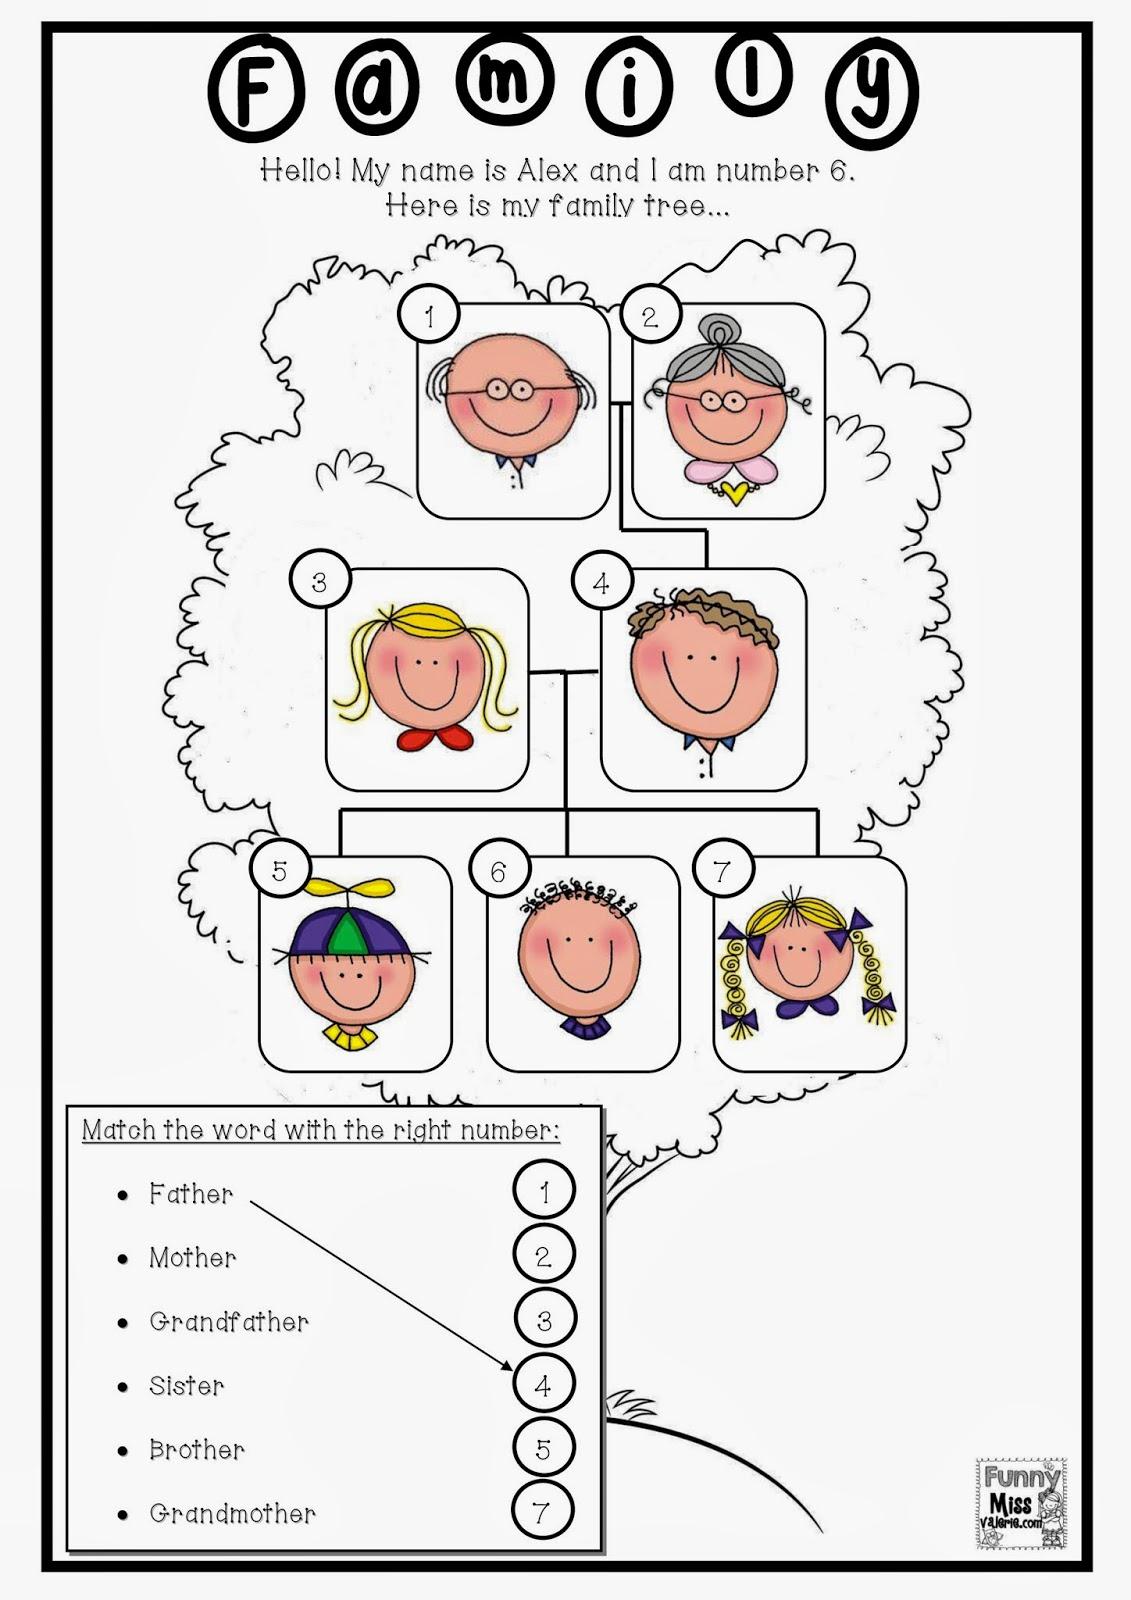 Enchanting Worksheets On Family For Grade 1 For Funny Miss ValÃ